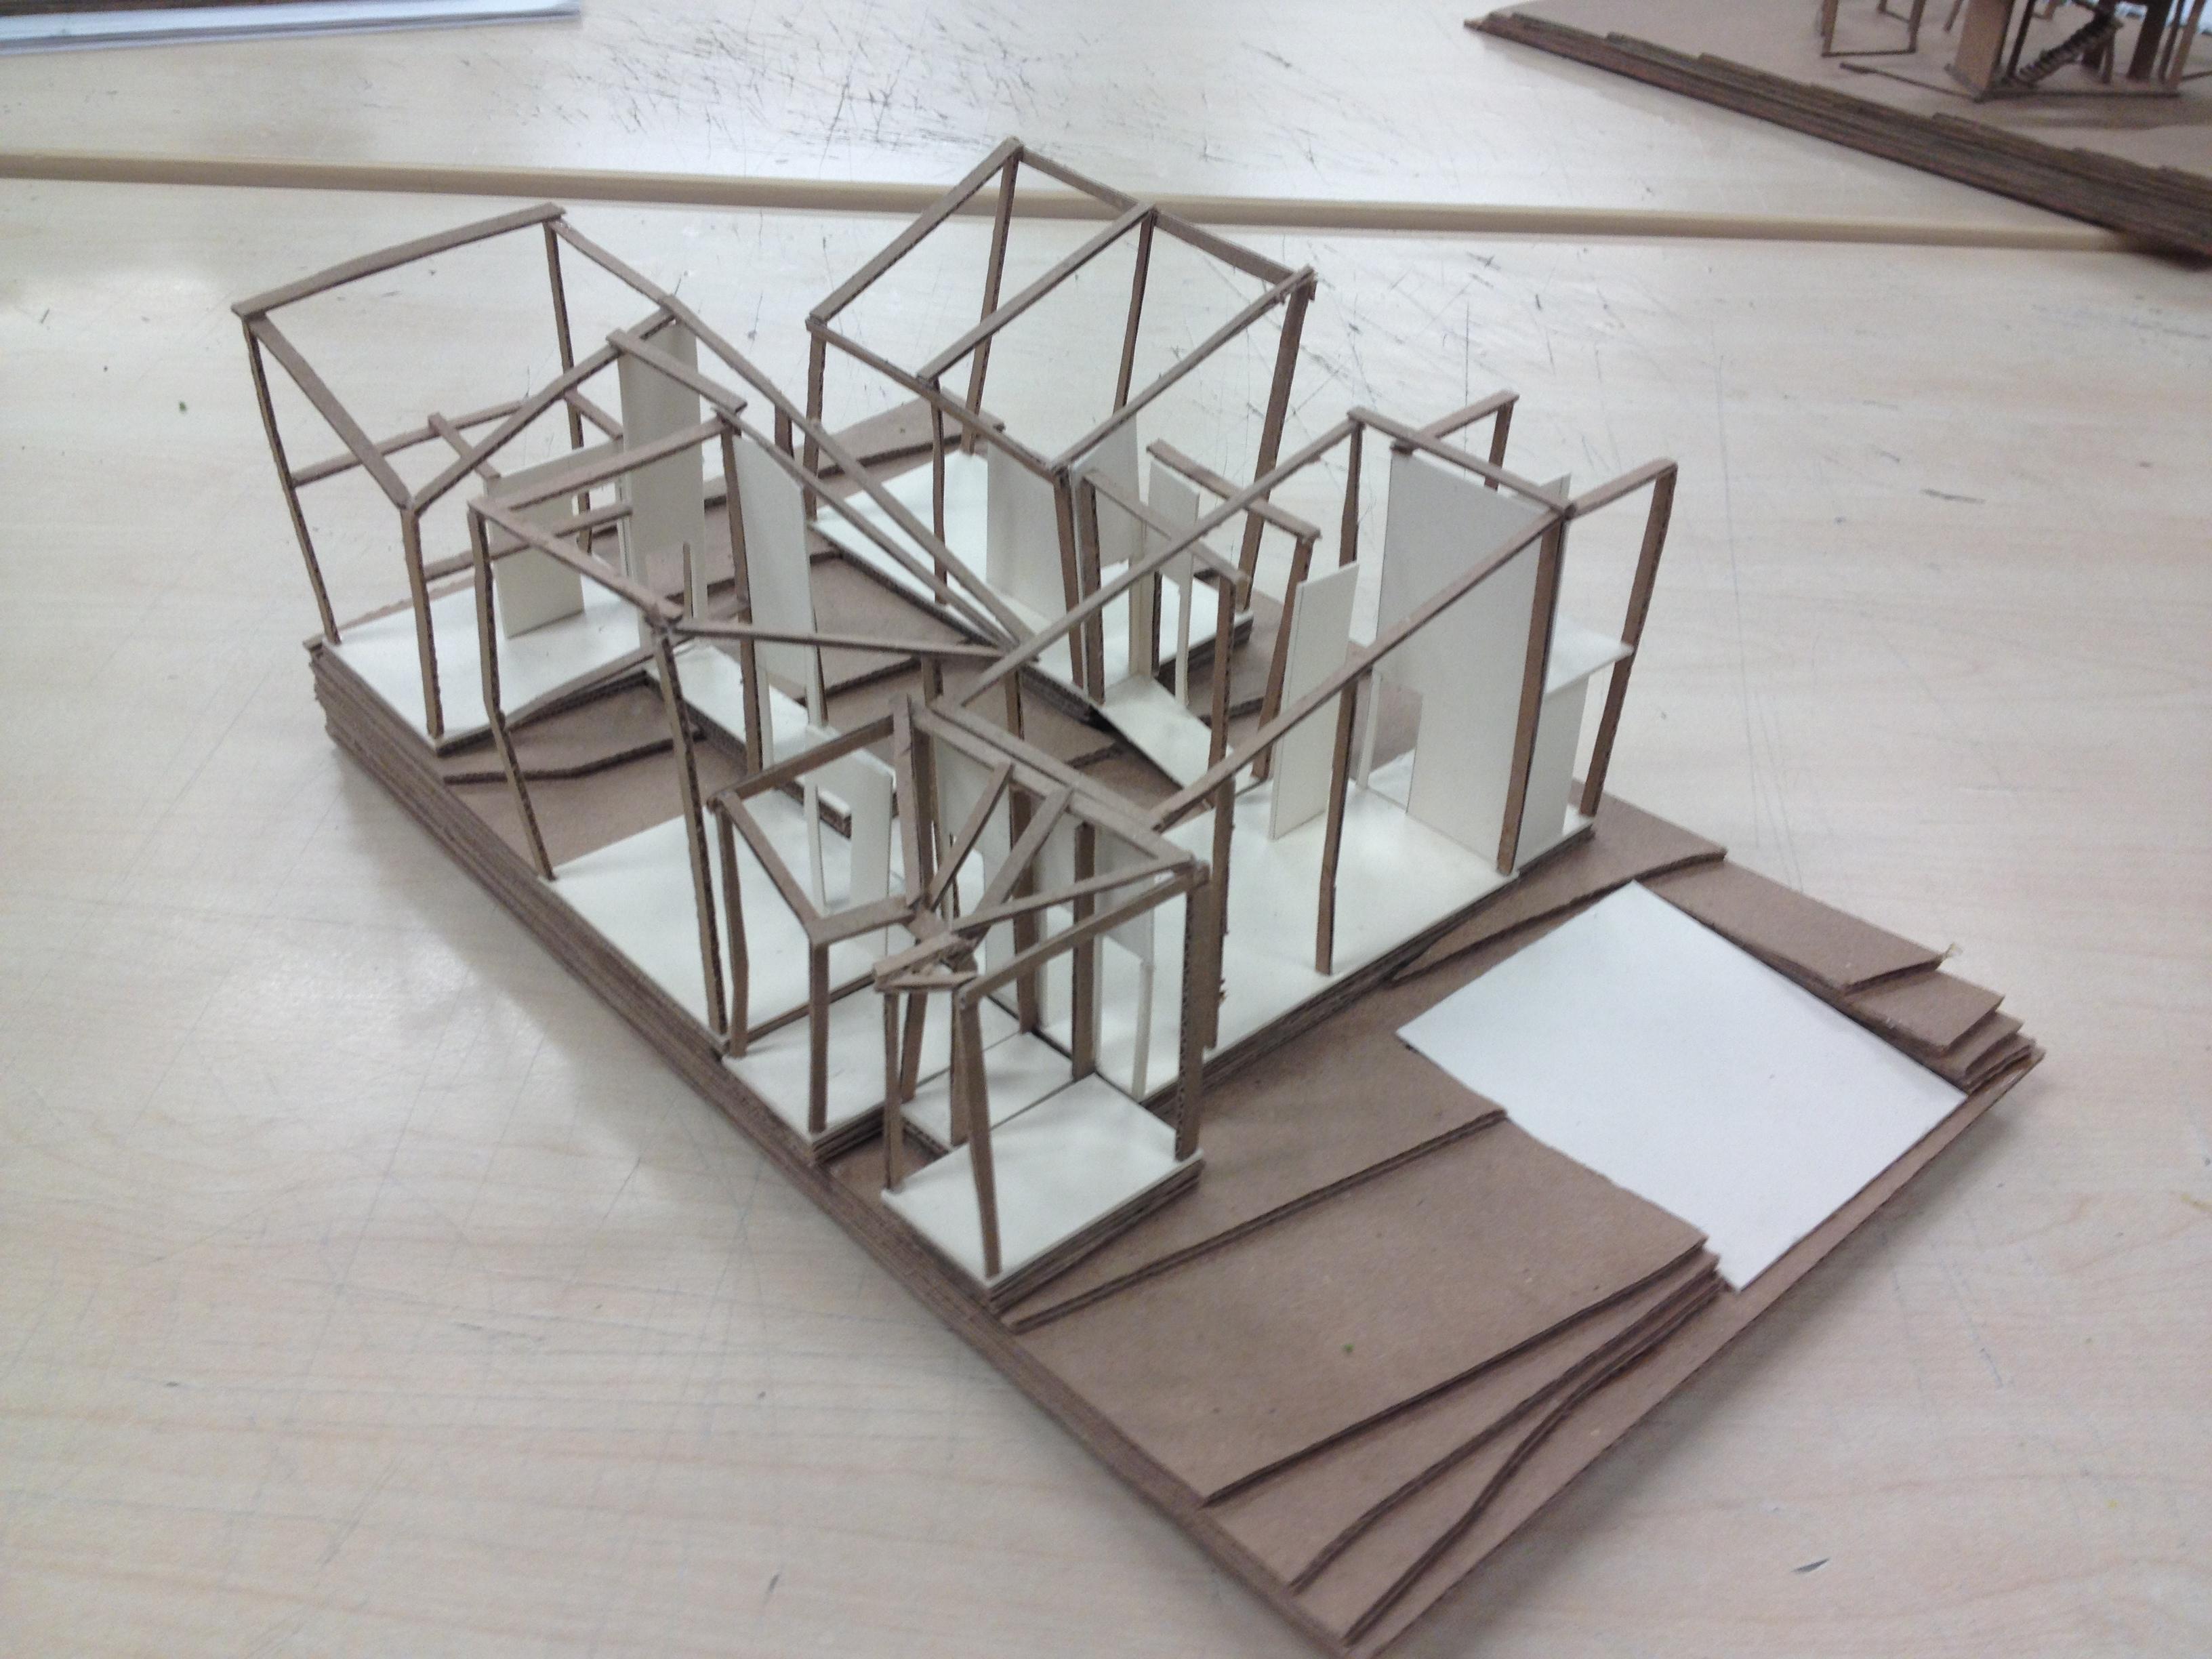 Maqueta de estructura rese arch for Estructuras arquitectonicas